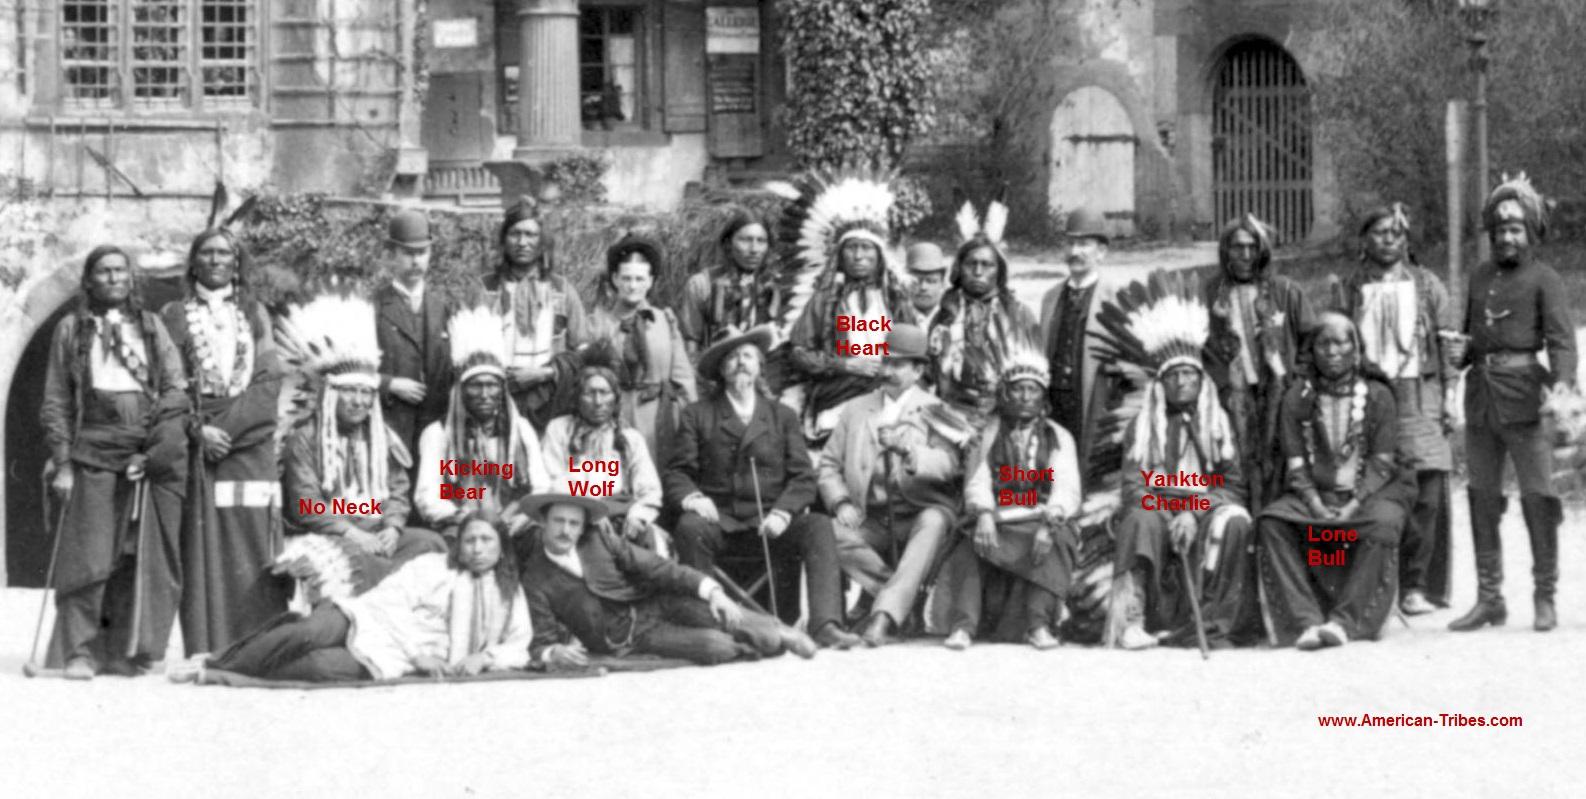 http://www.american-tribes.com/messageboards/dietmar/SiouxHeidelbergID.jpg